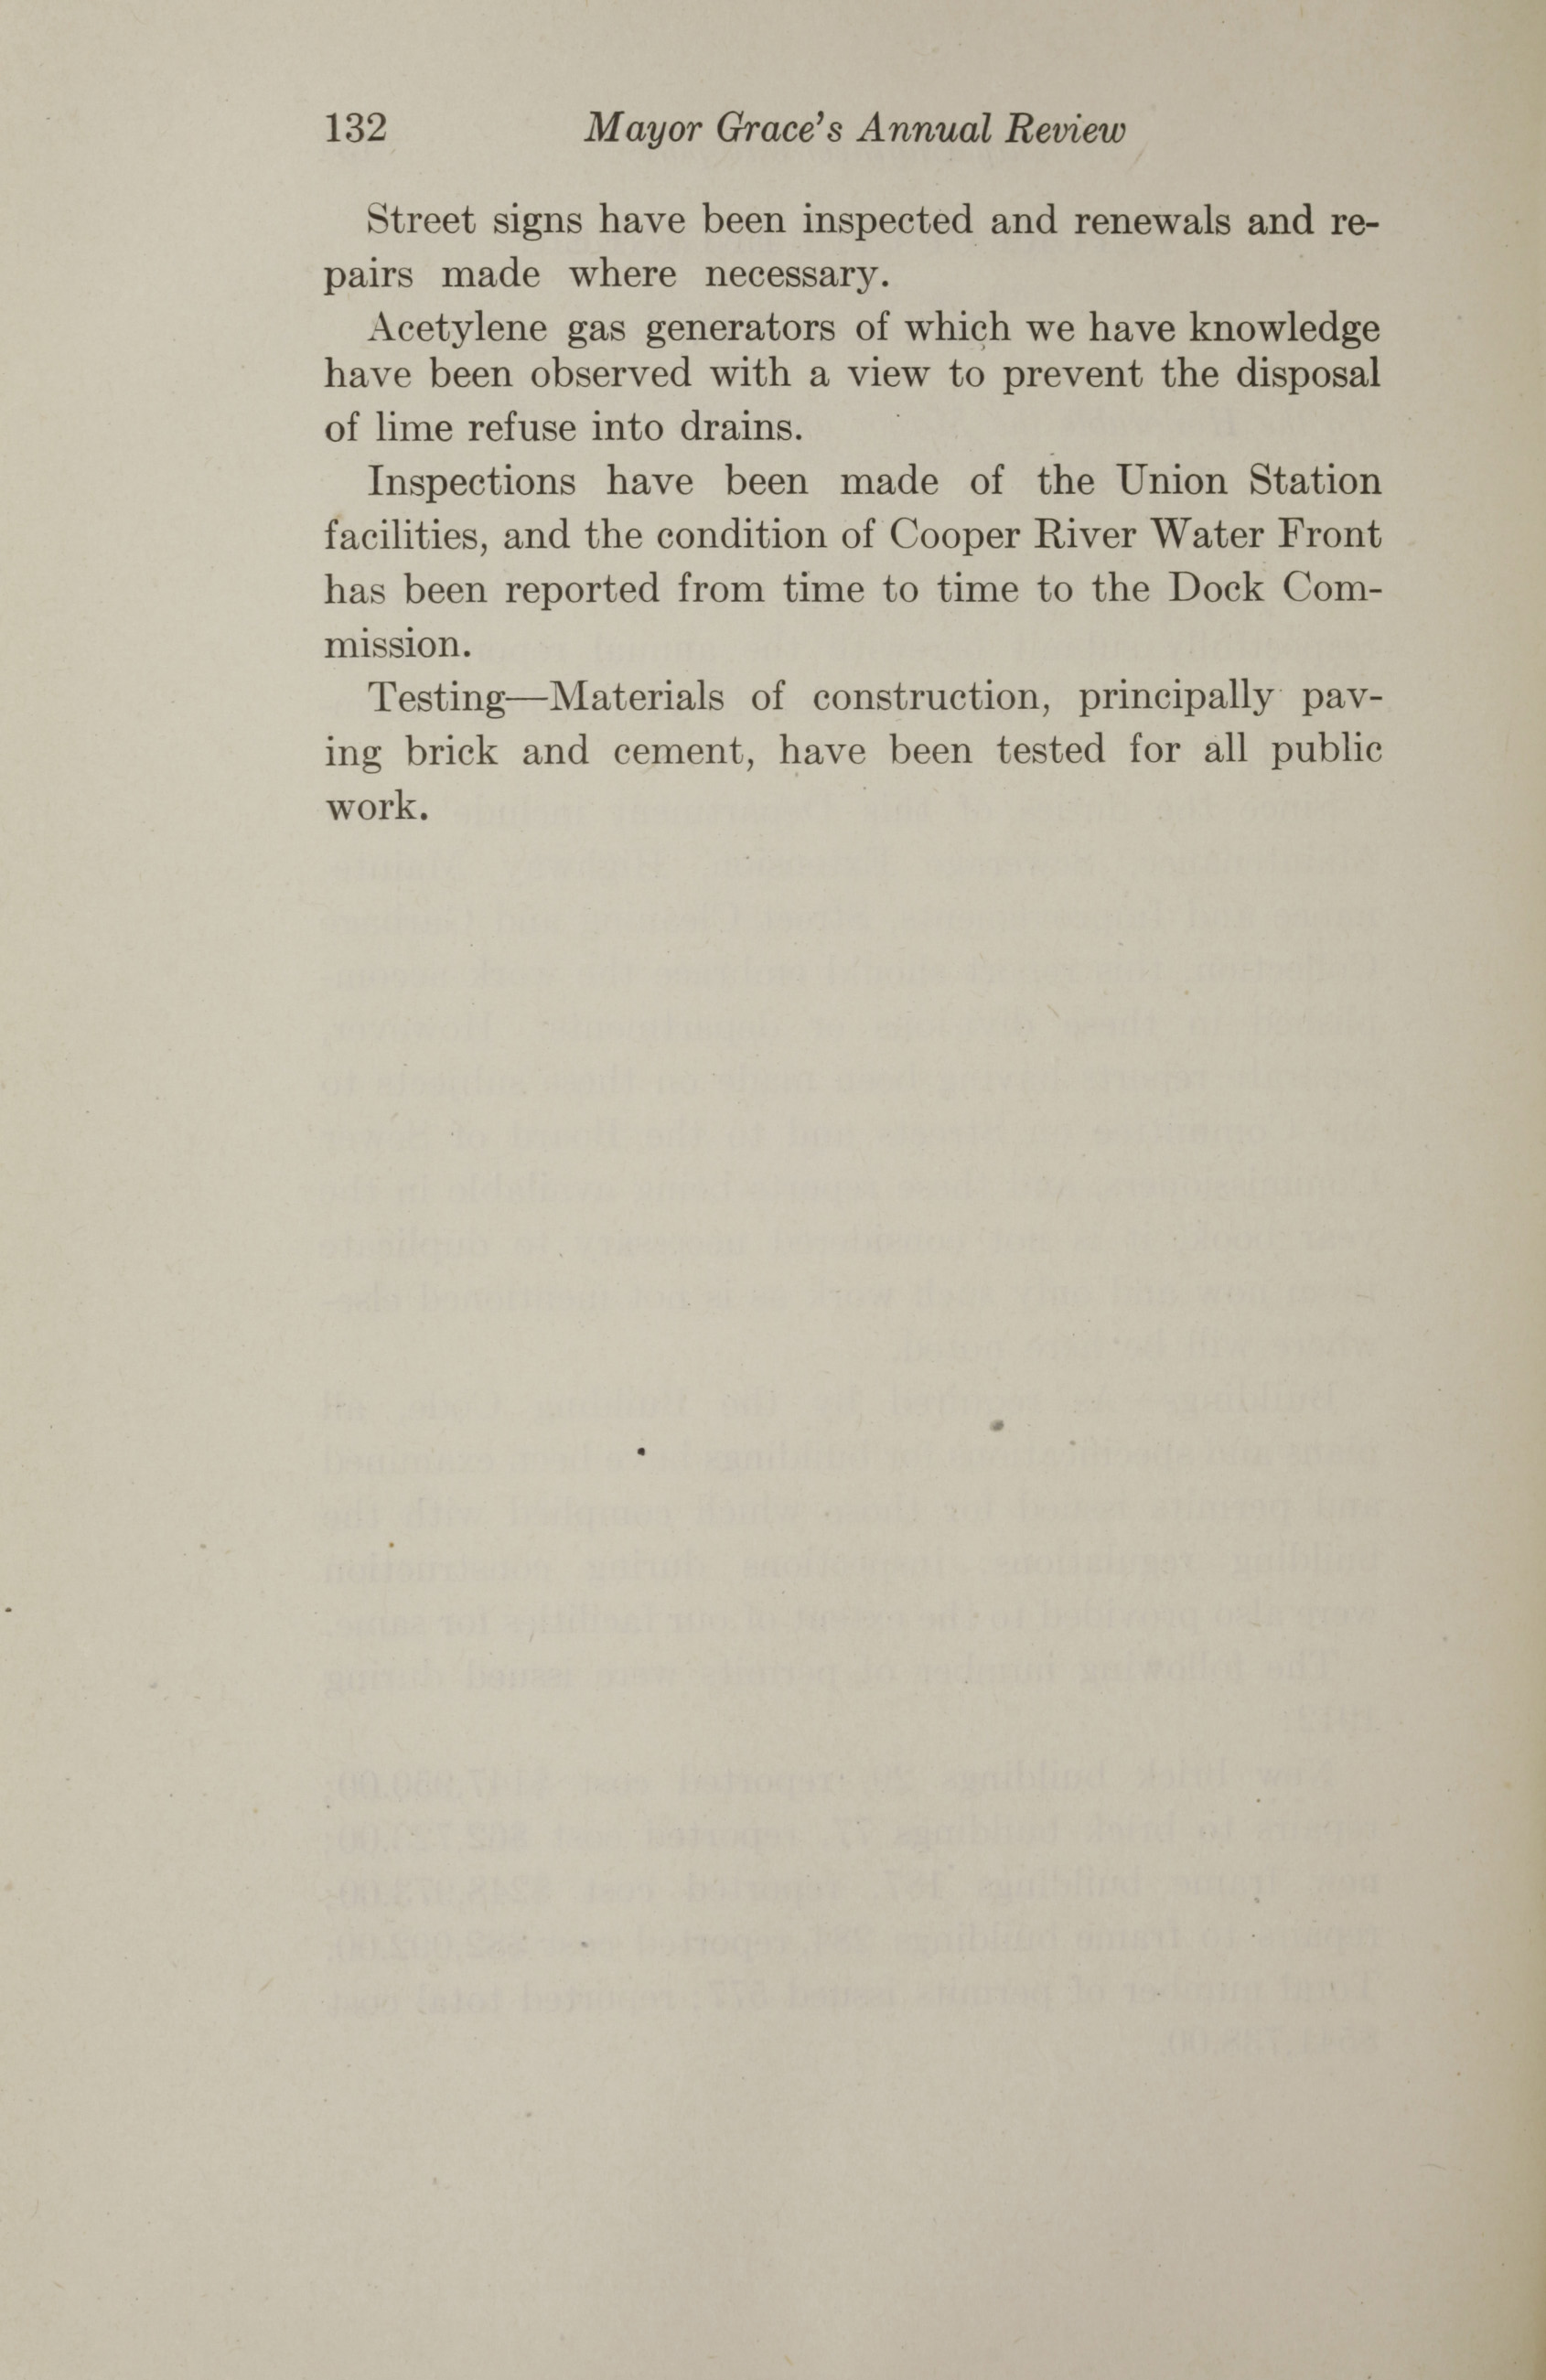 Charleston Yearbook, 1912, page 132